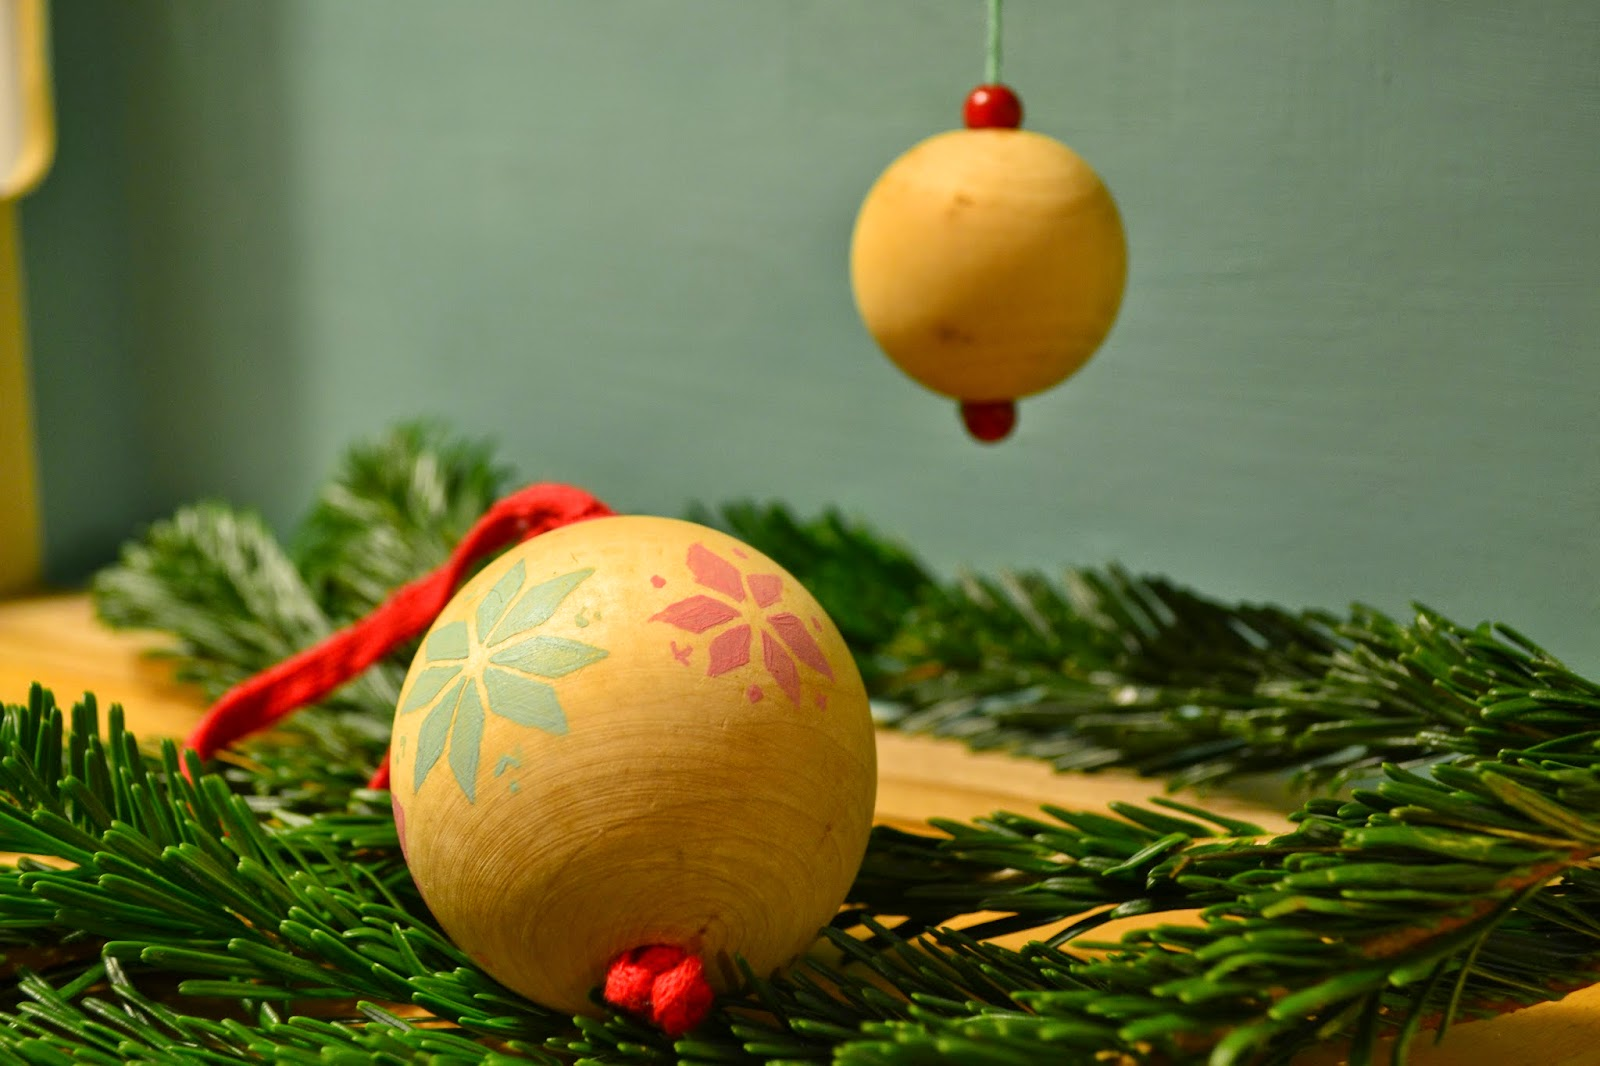 jurinde macht was anleitung weihnachtskugeln selbst bemalen. Black Bedroom Furniture Sets. Home Design Ideas